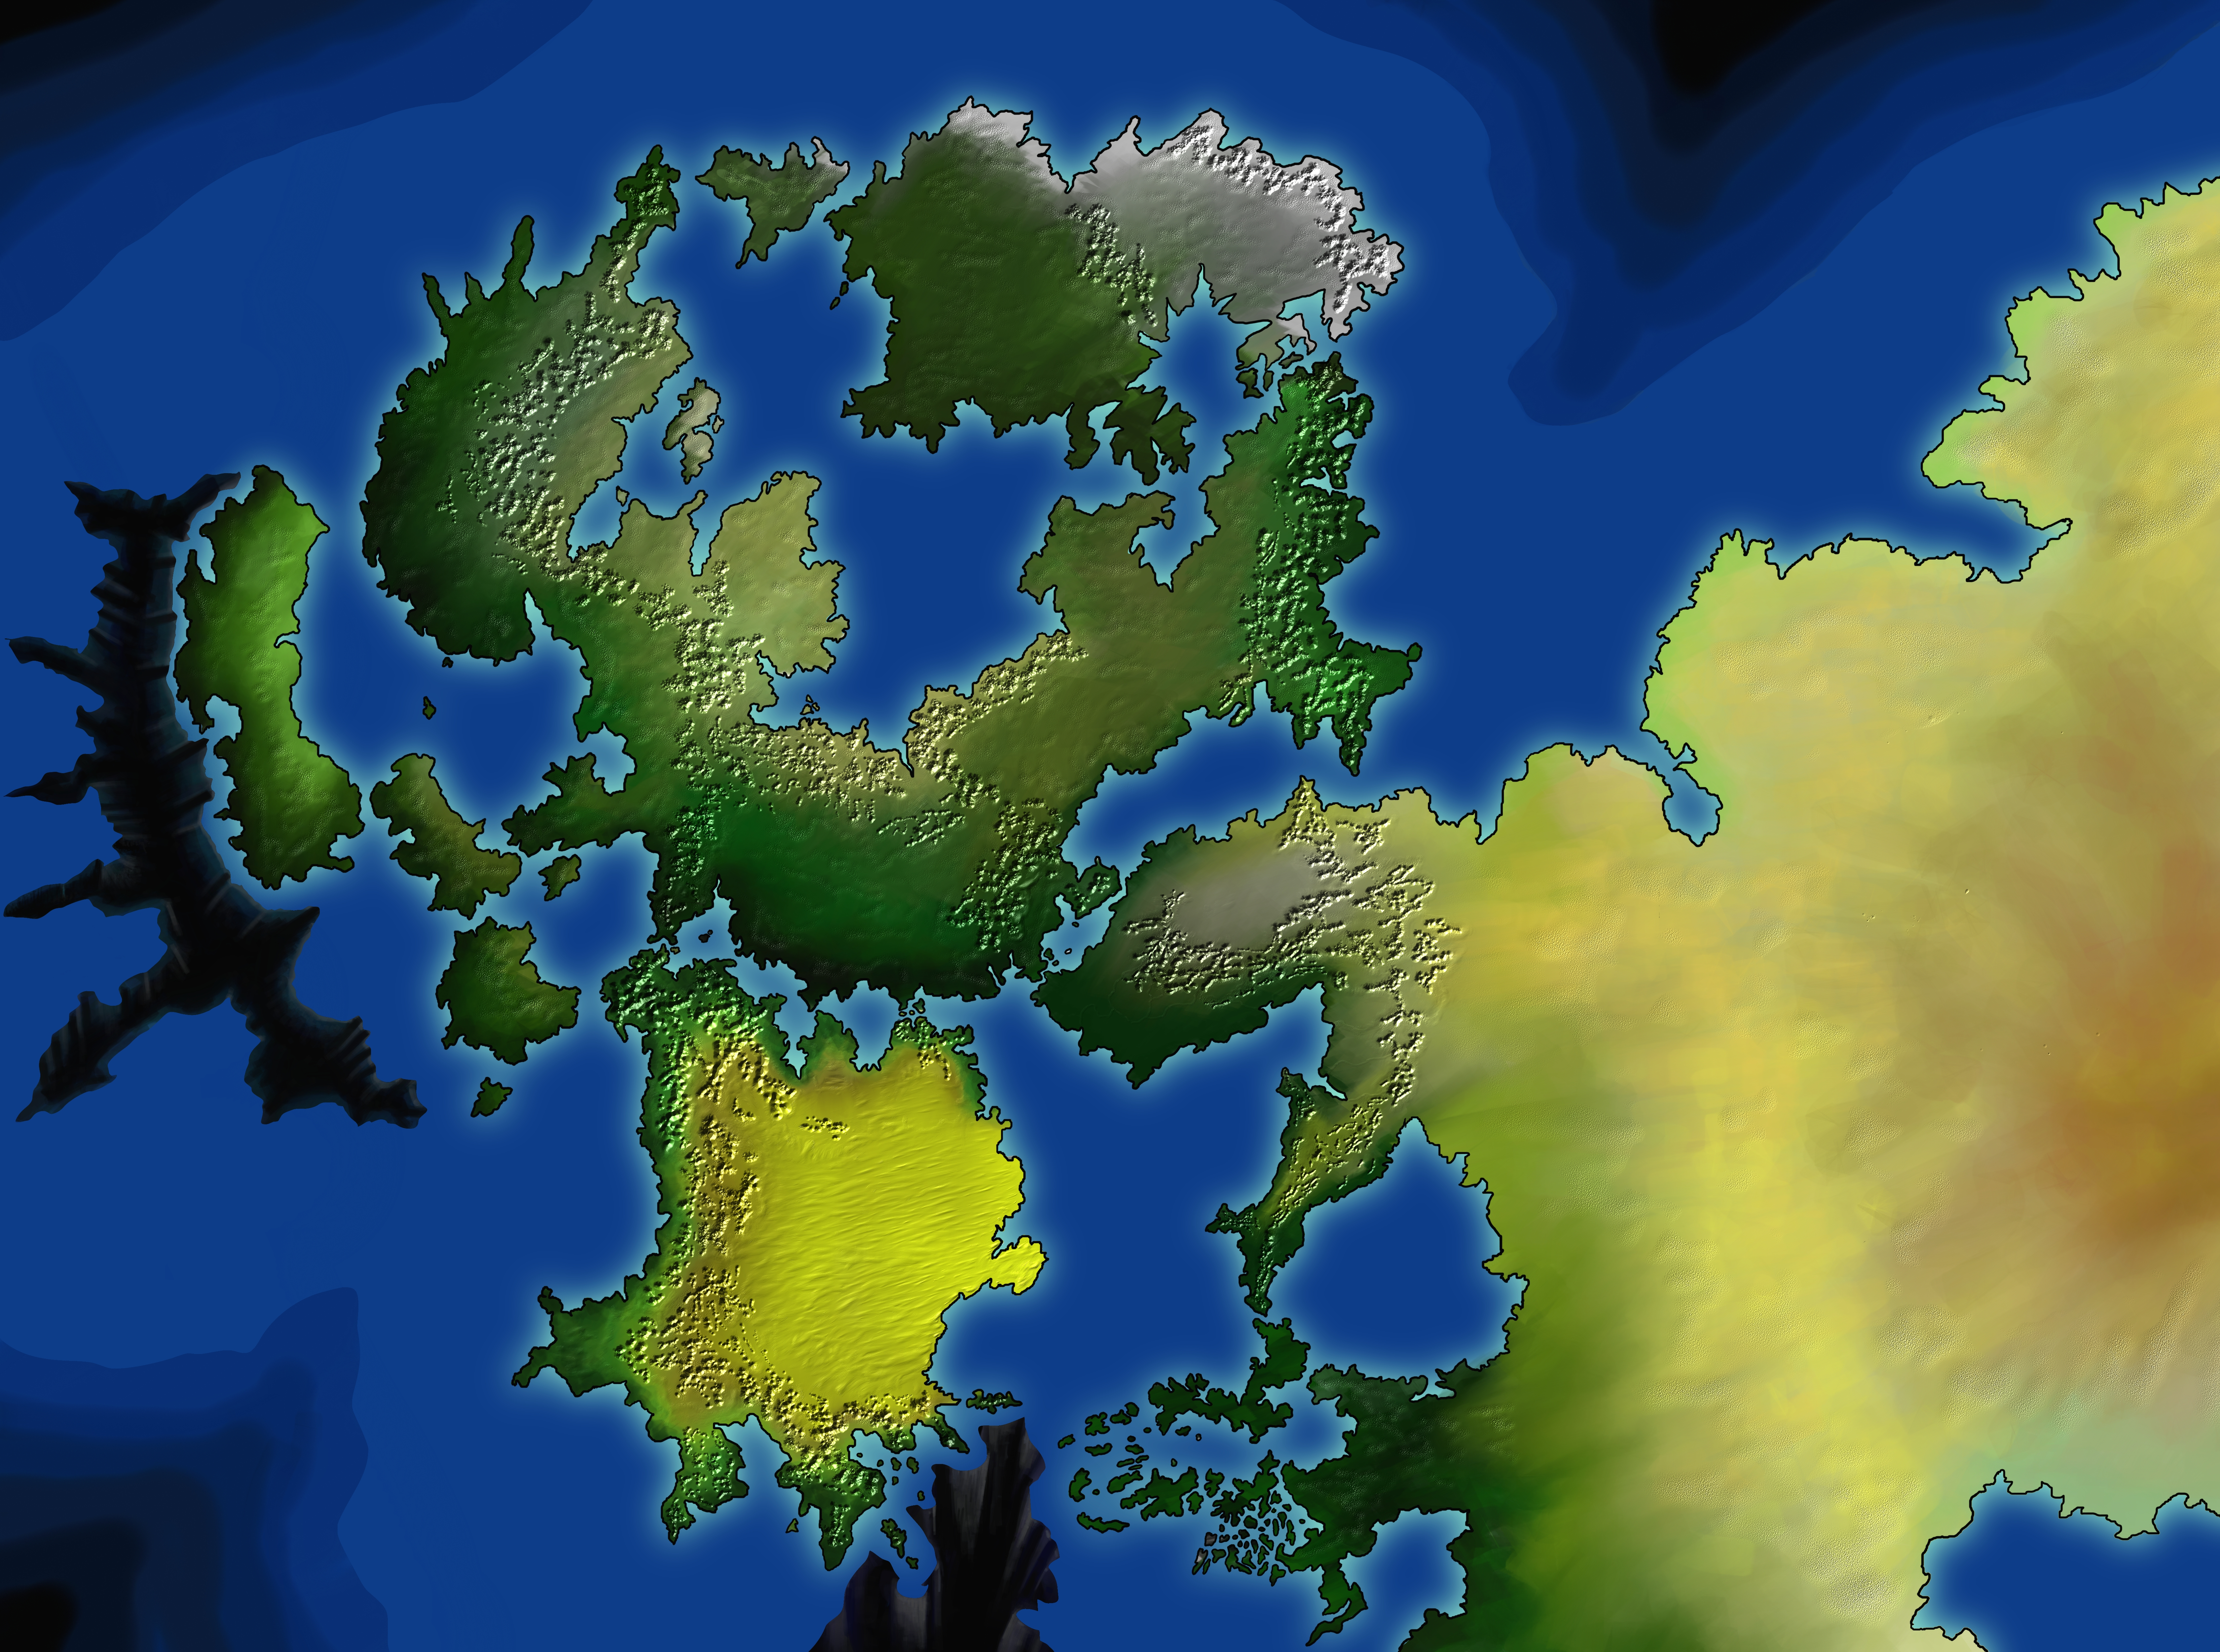 Fantasy world map by HendelMasad on DeviantArt